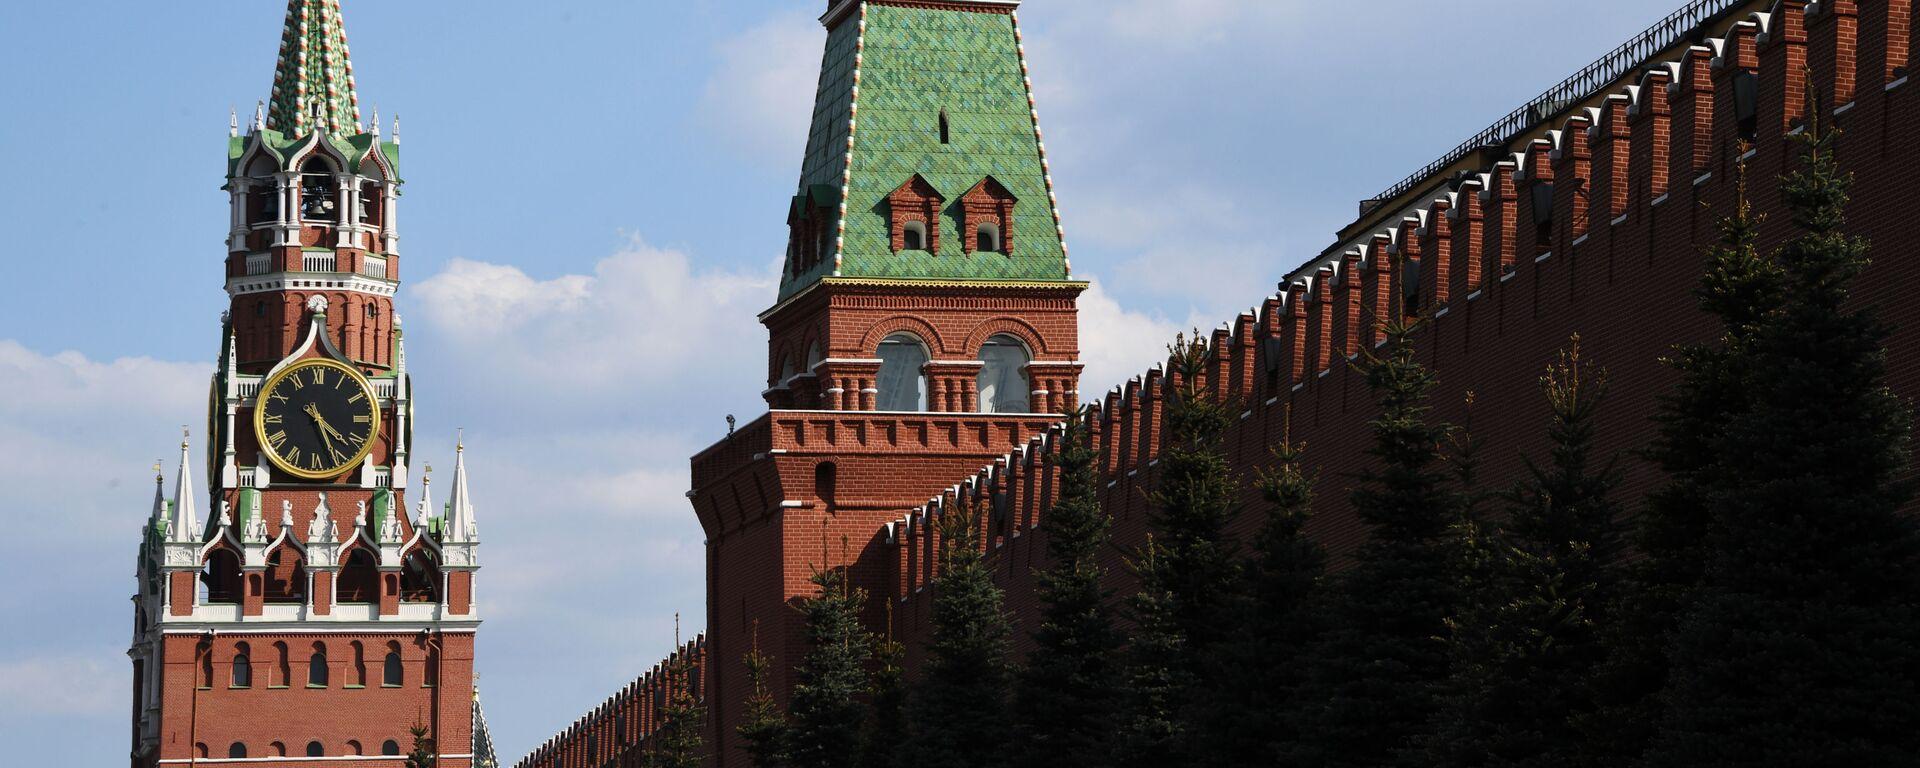 Kreml, Moskwa - Sputnik Polska, 1920, 28.09.2021